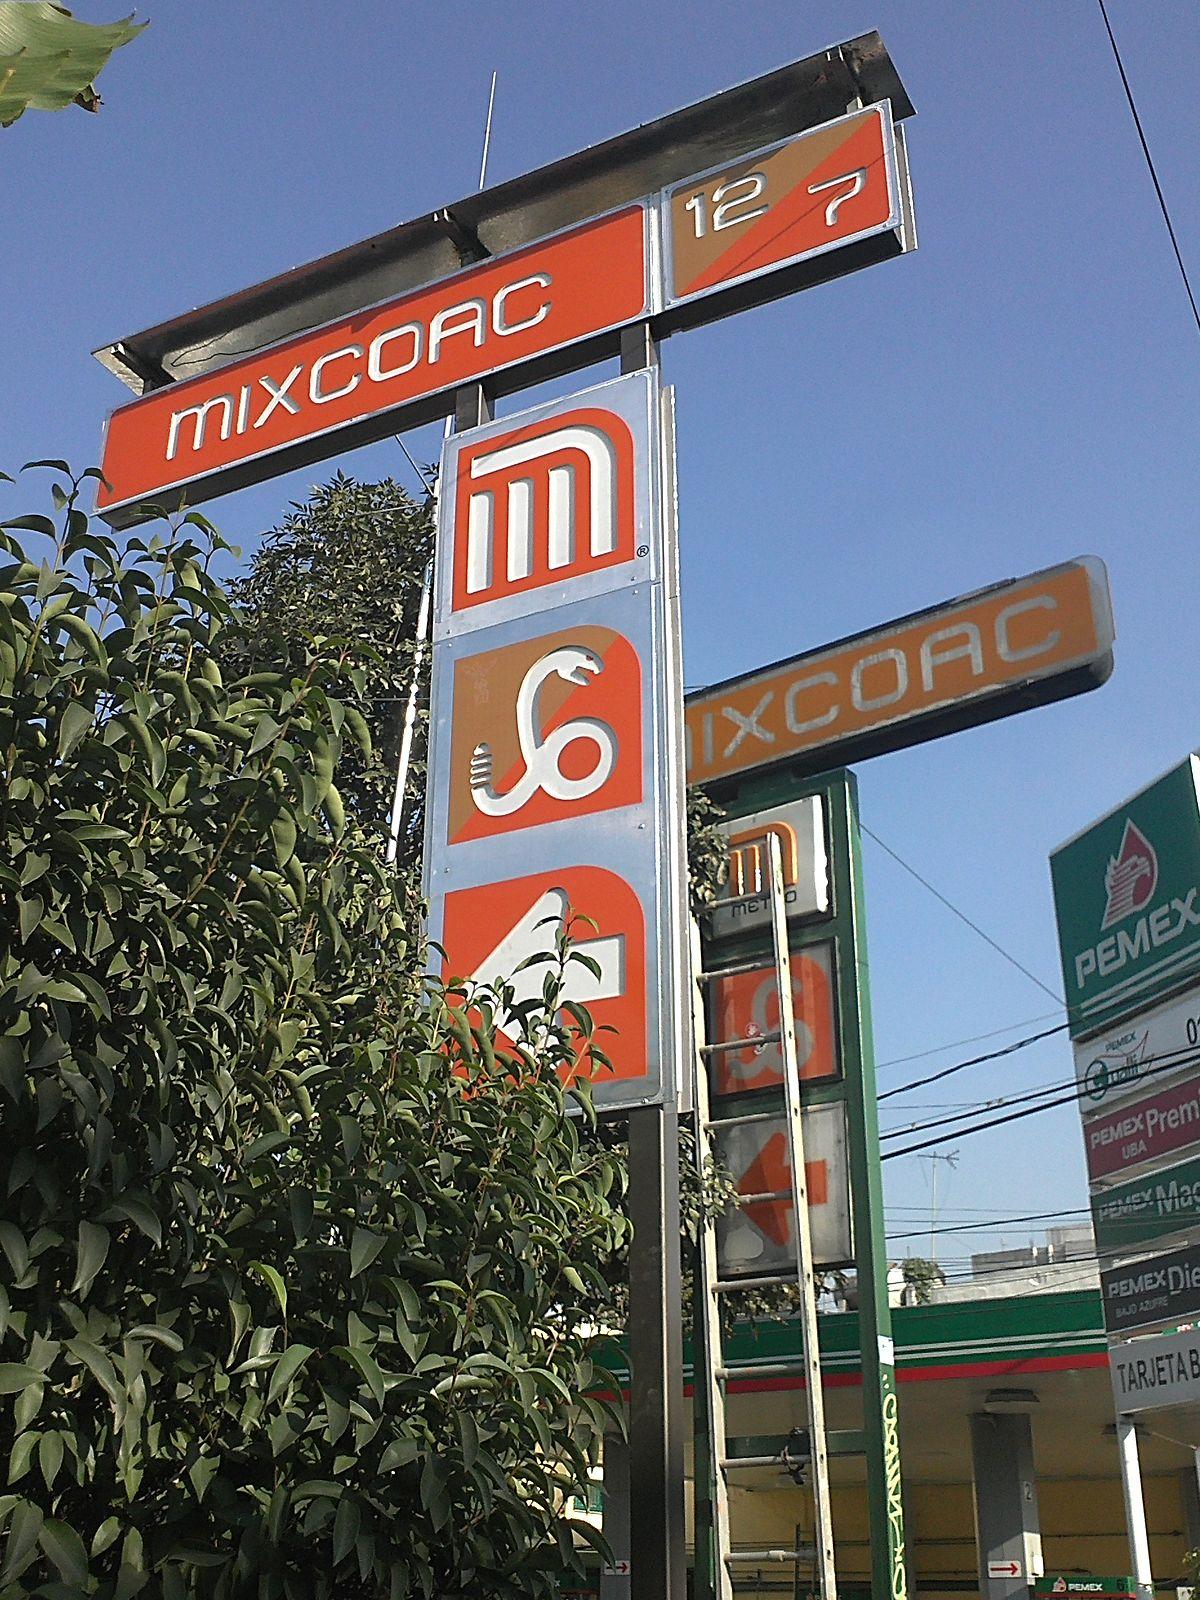 Mixcoac (estación) - Wikipedia, la enciclopedia libre